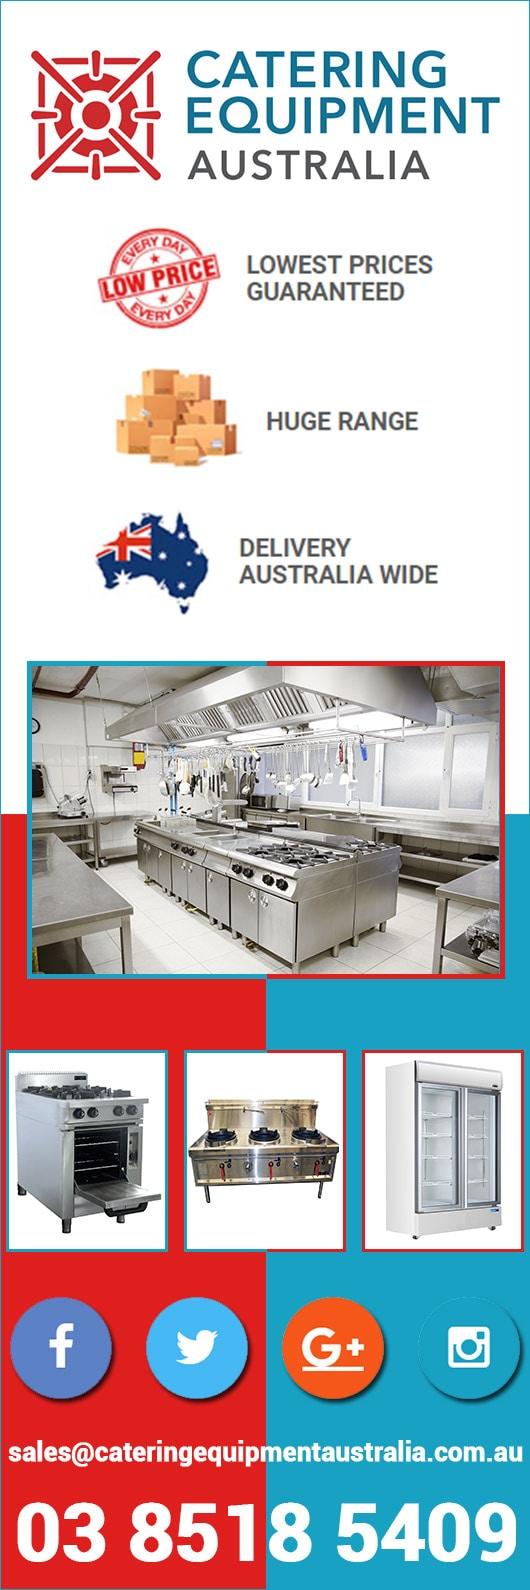 Catering Equipment Australia Commercial Kitchen Equipment Brisbane